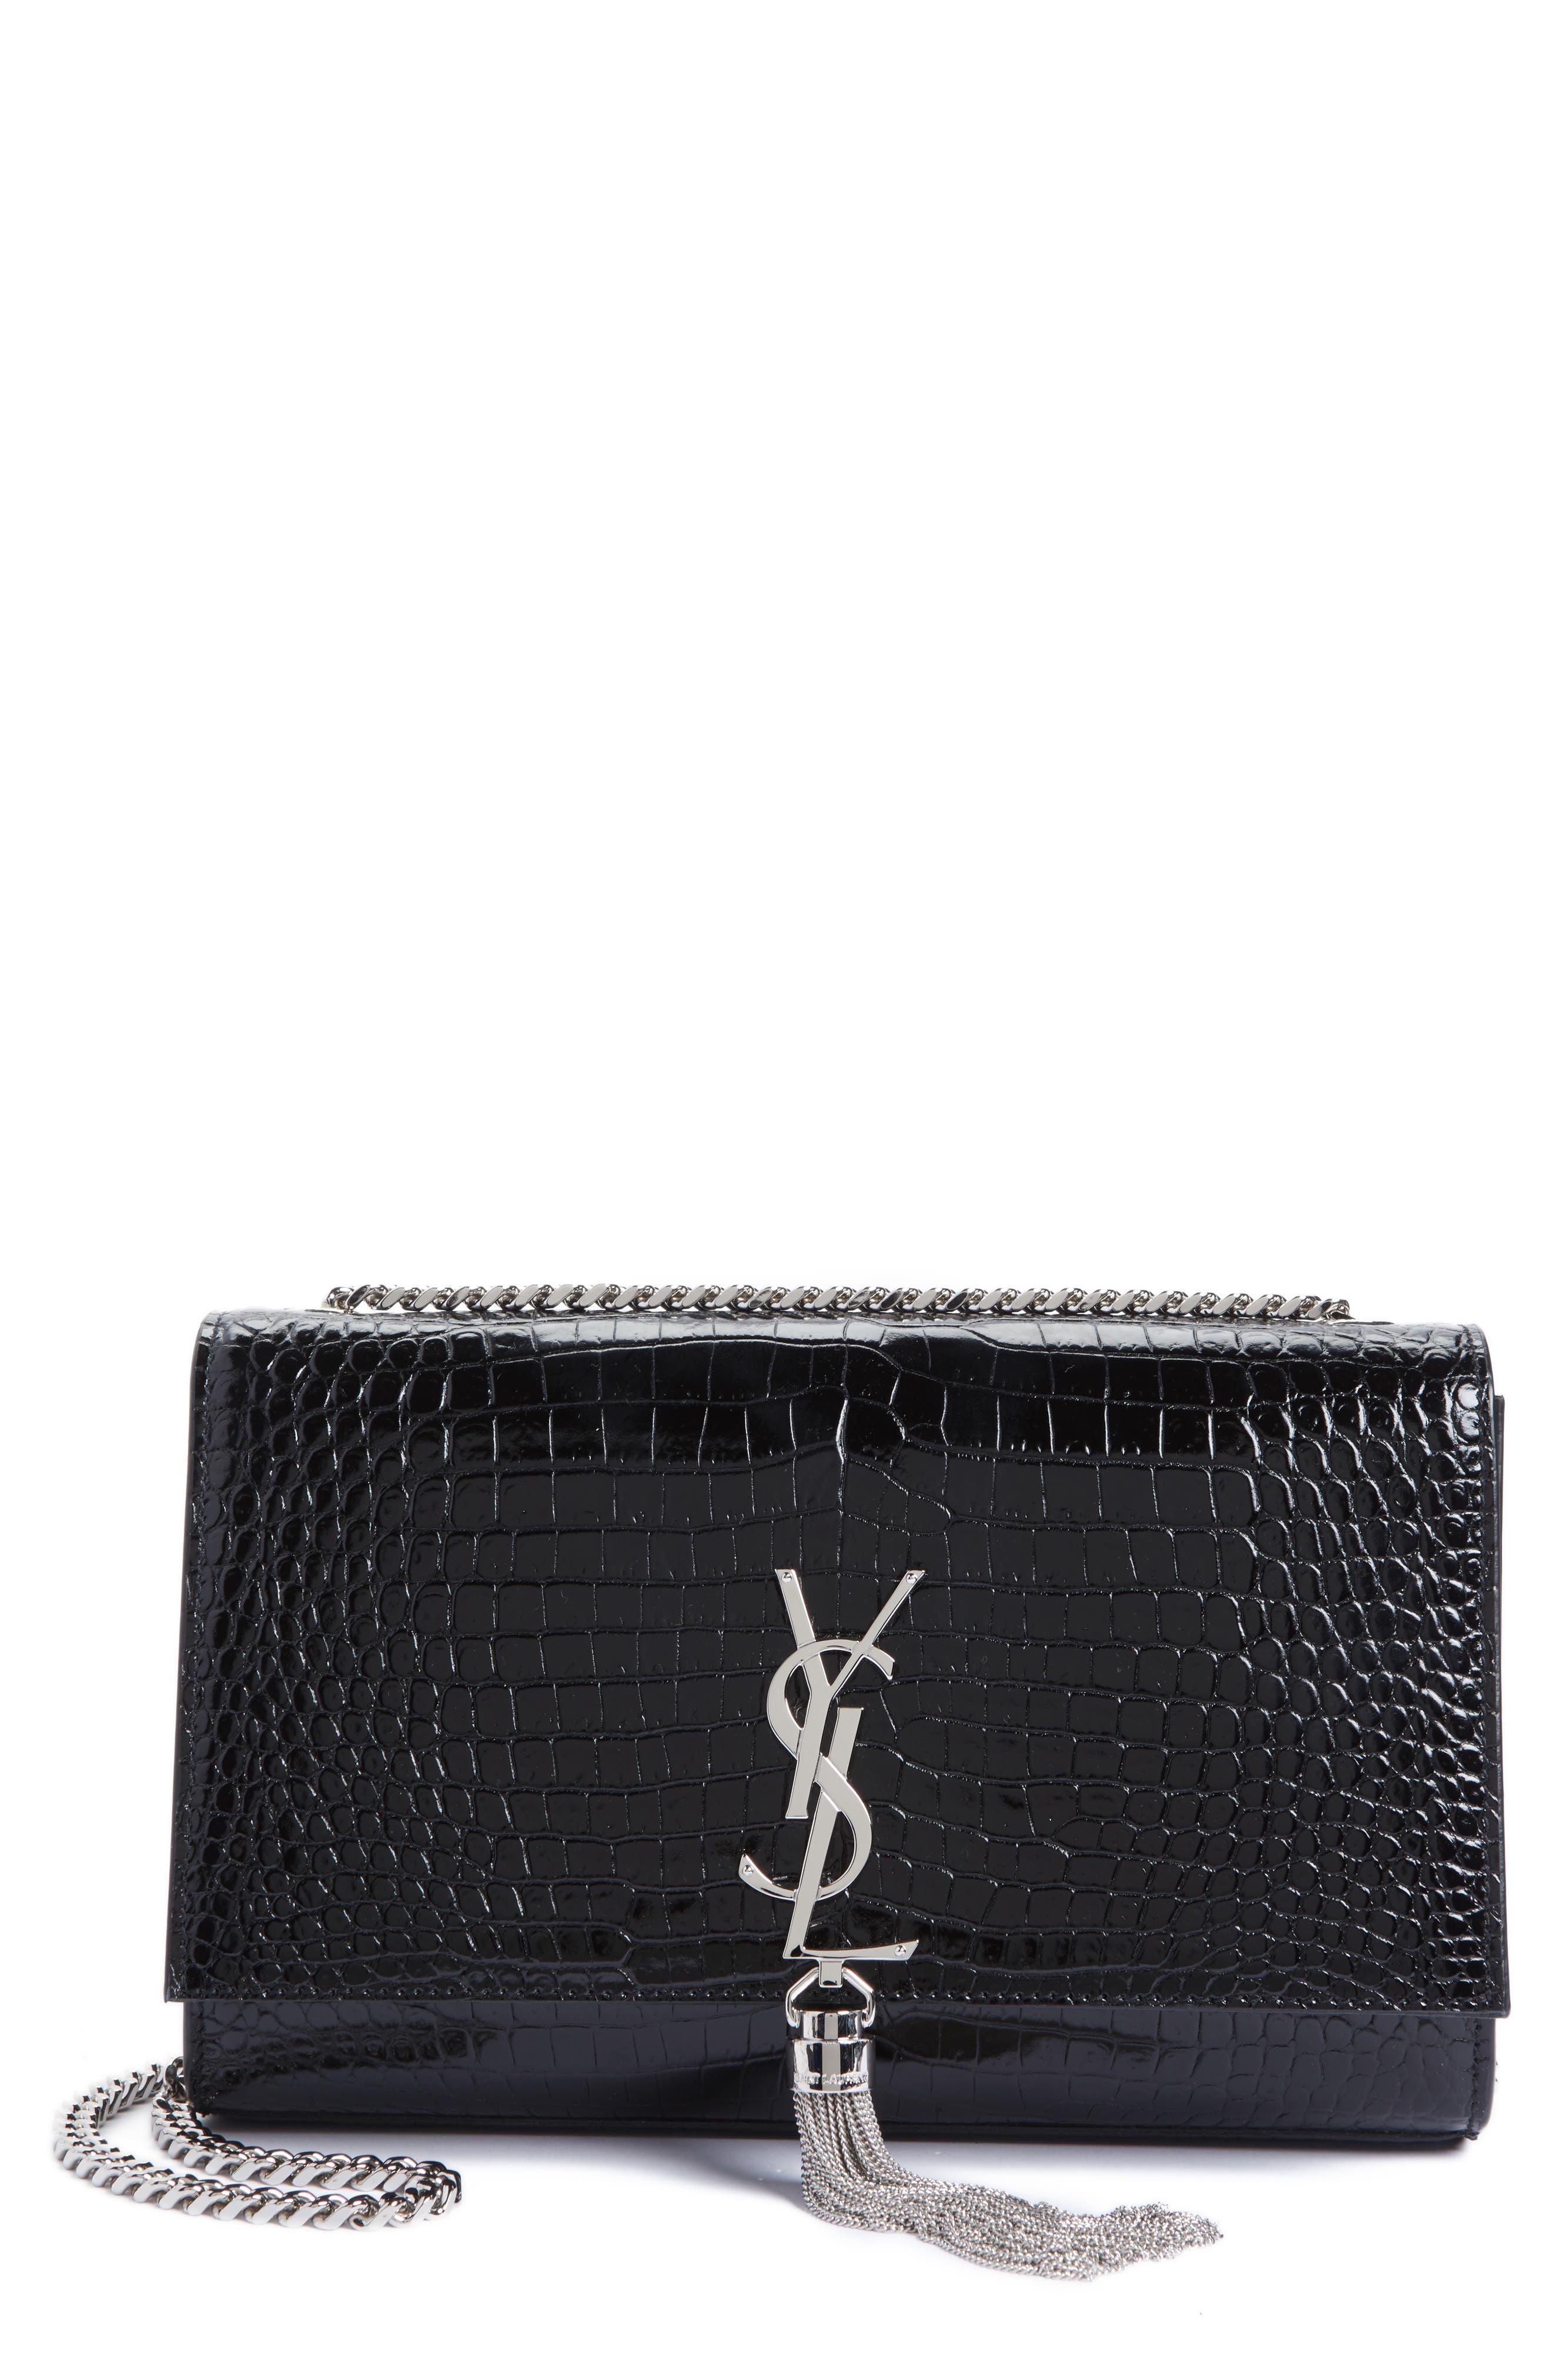 Saint Laurent Medium Kate Tassel Croc Embossed Calfskin Leather Crossbody Bag